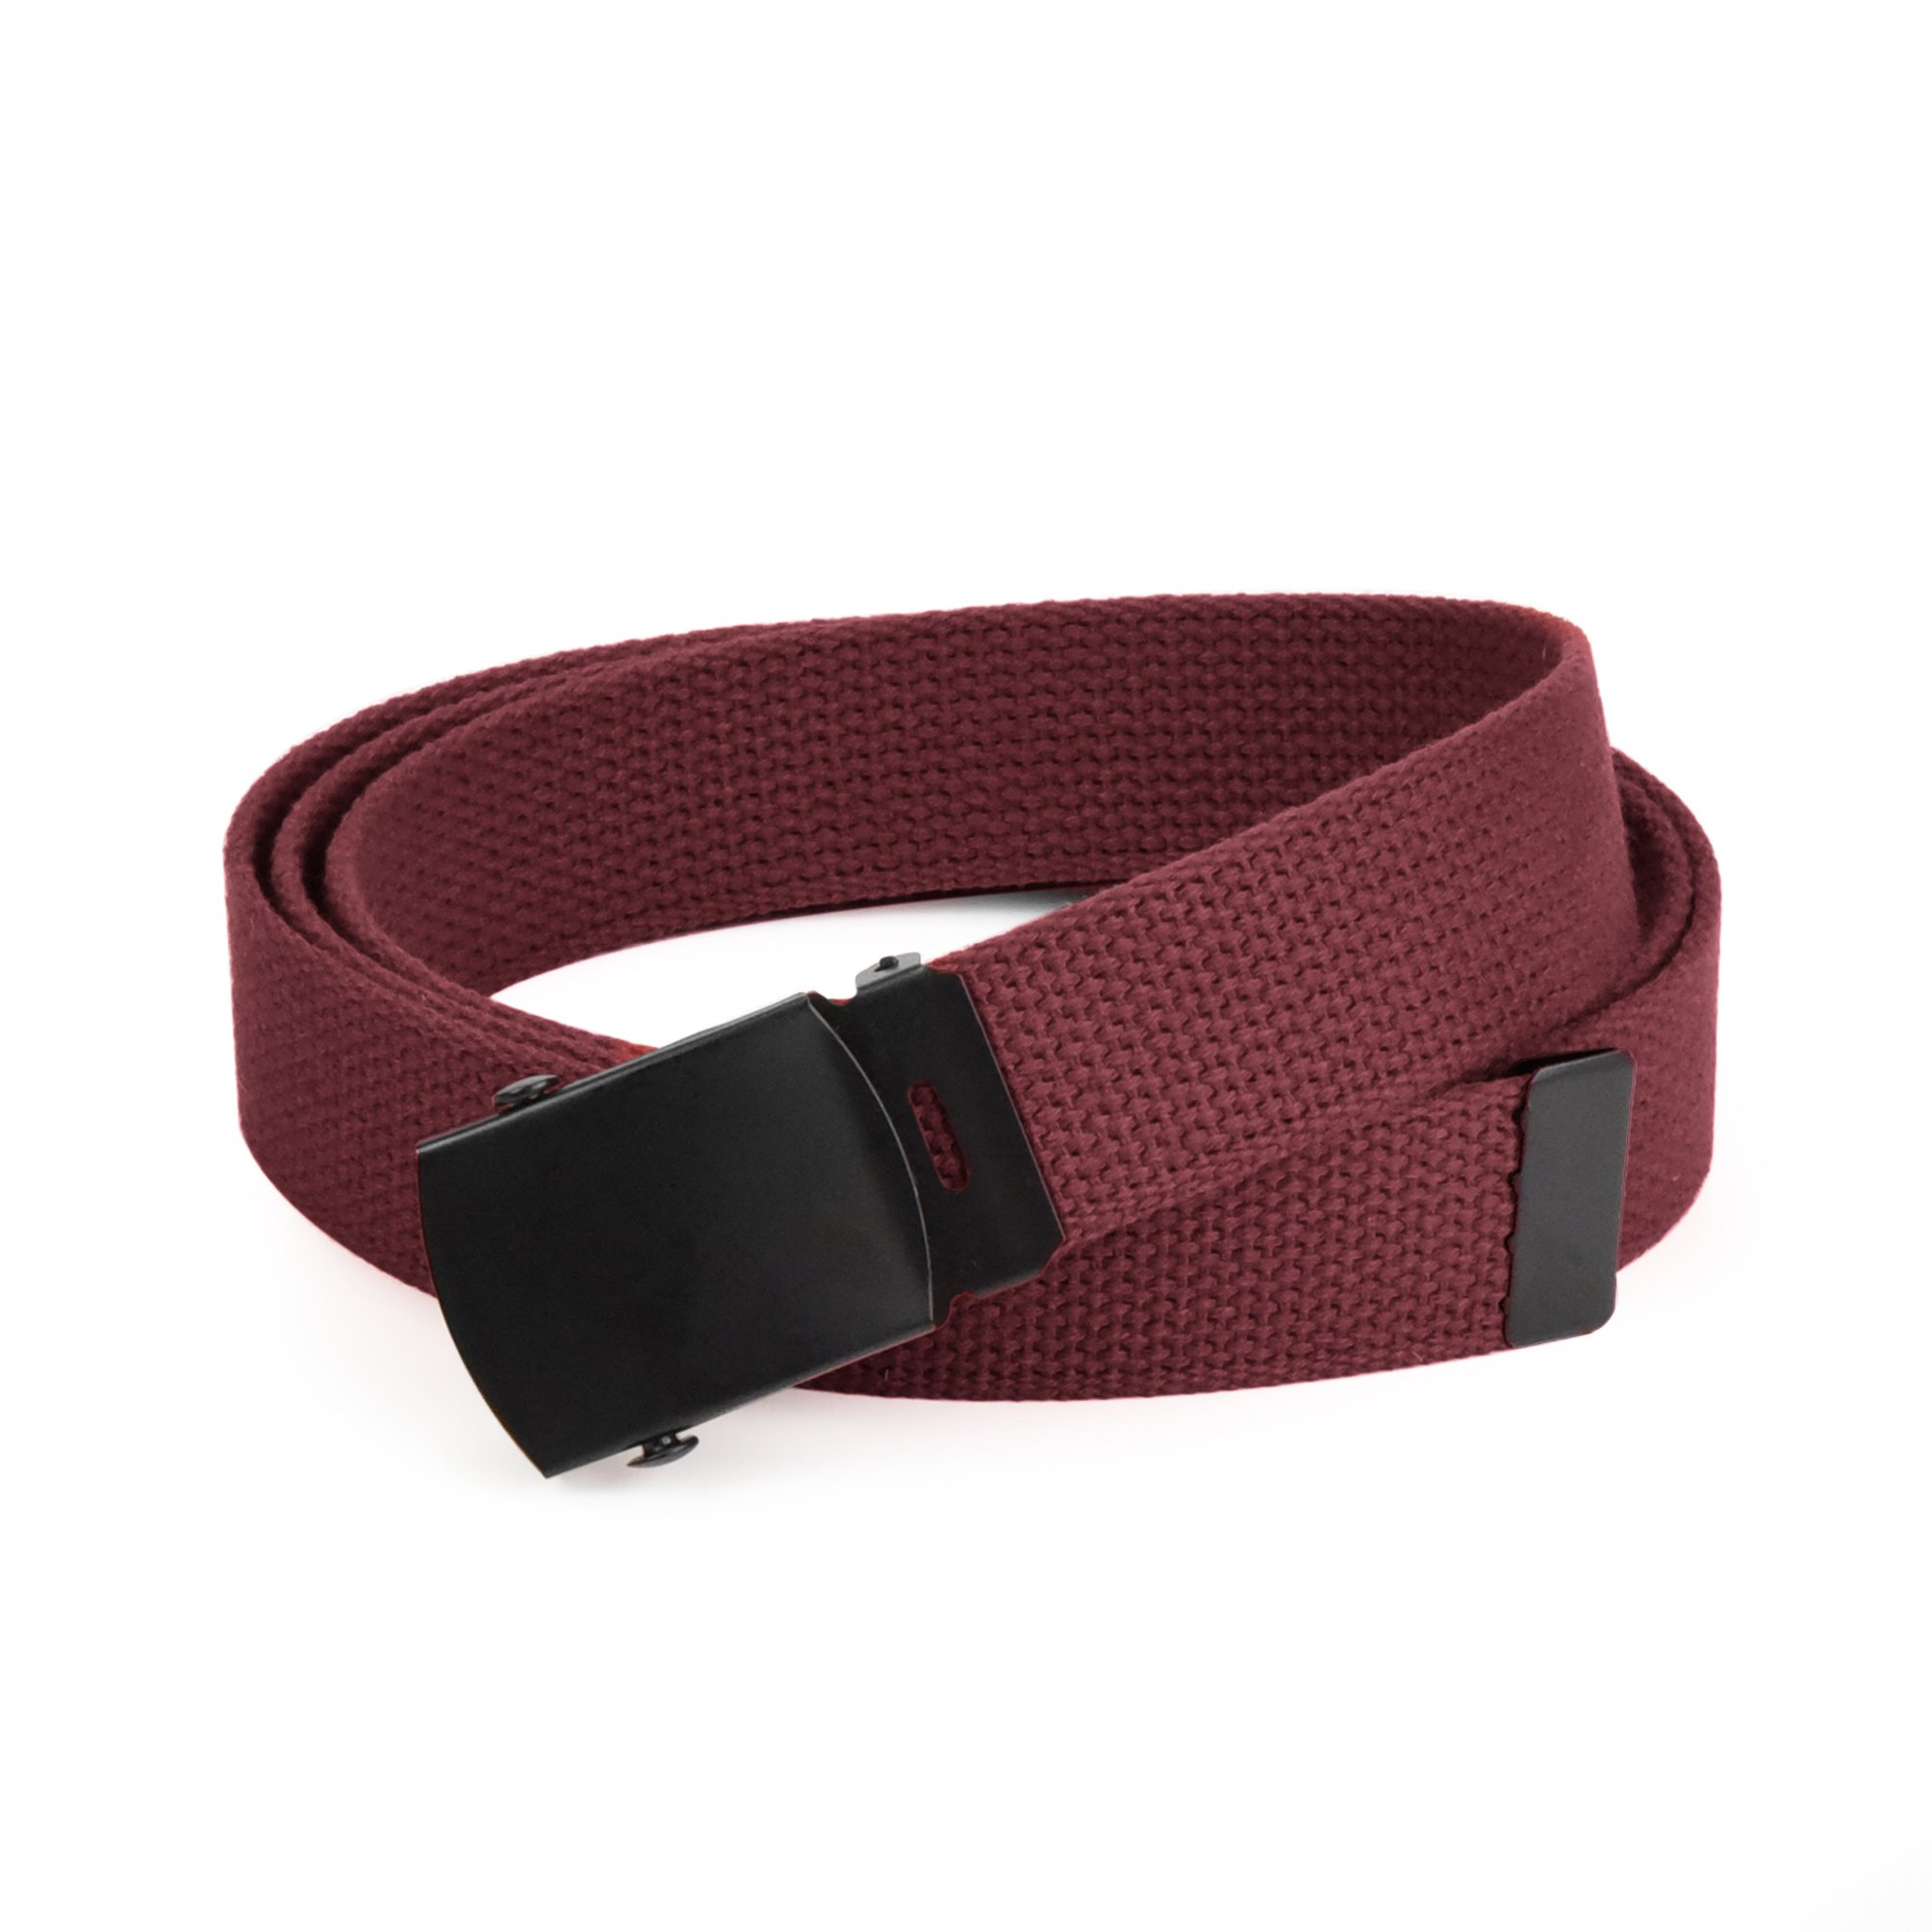 Hold'Em Military Canvas Webbing Belts for MEN'S–Black Buckle – Universal Heavy Duty Adjustable KEEP PANTS SNUG WITHOUT IRRITATING your skin-Burgundy